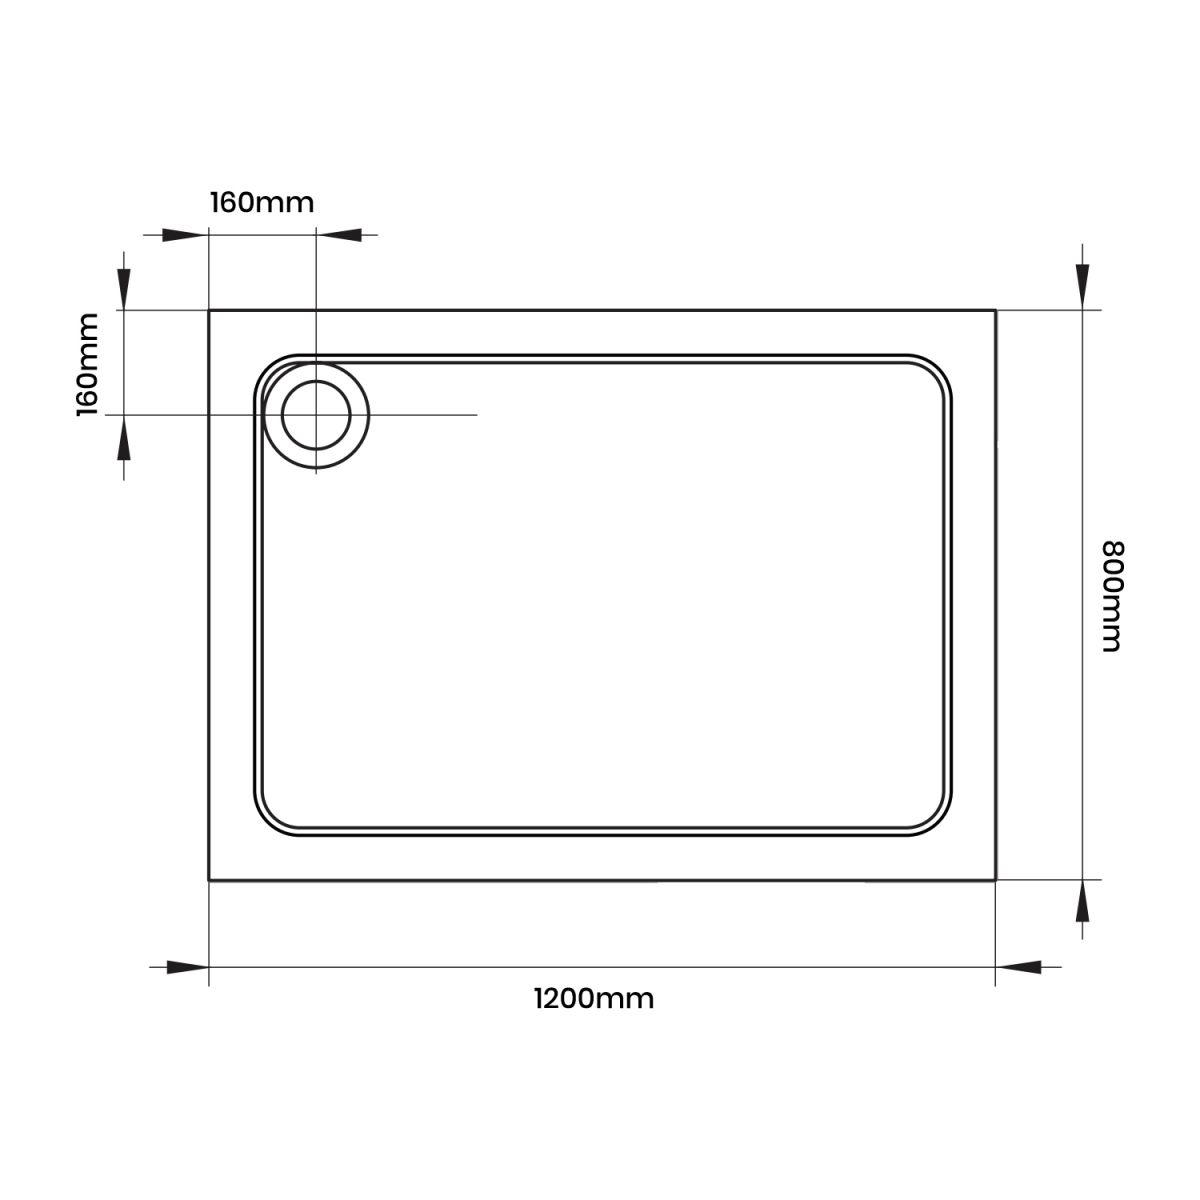 Aquadart Rectangular 1200 x 800 Shower Tray Line Drawing